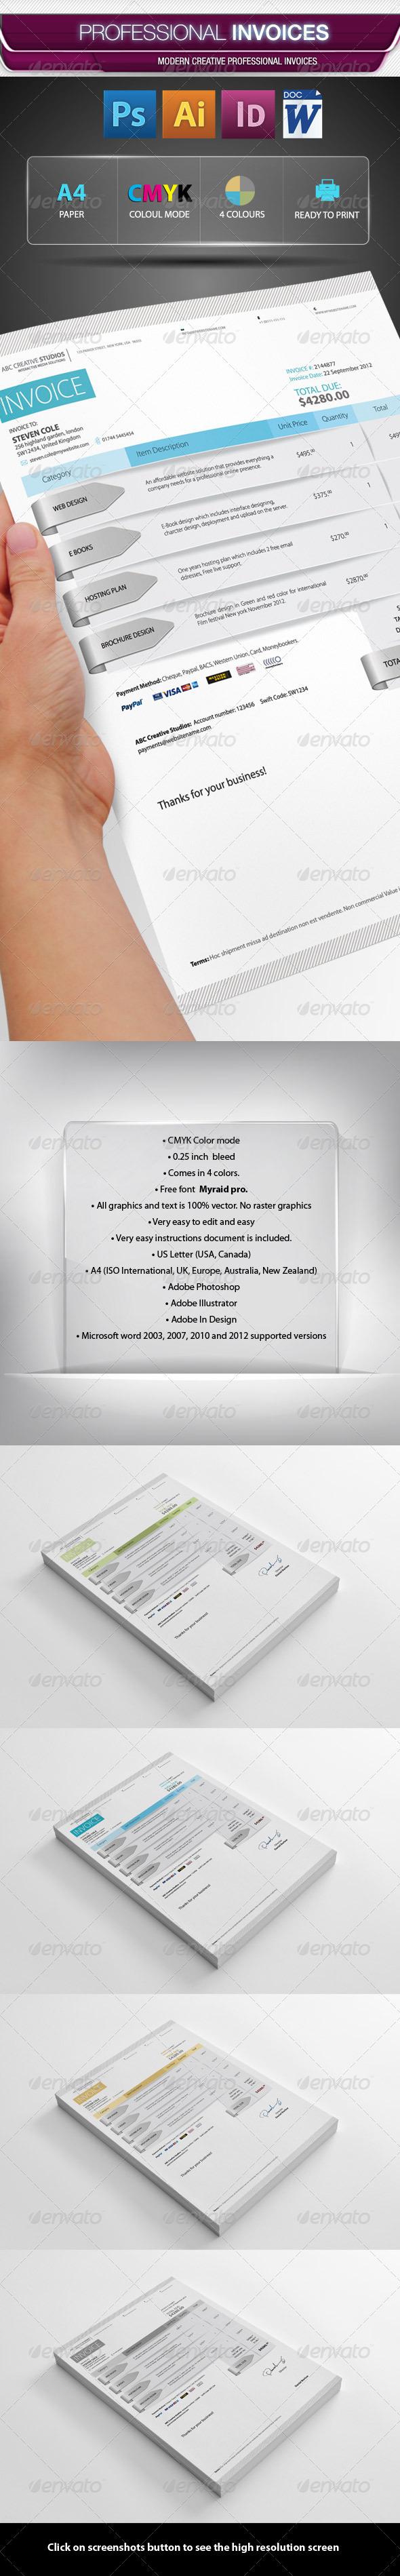 GraphicRiver Professional Invoice Pack 3616828